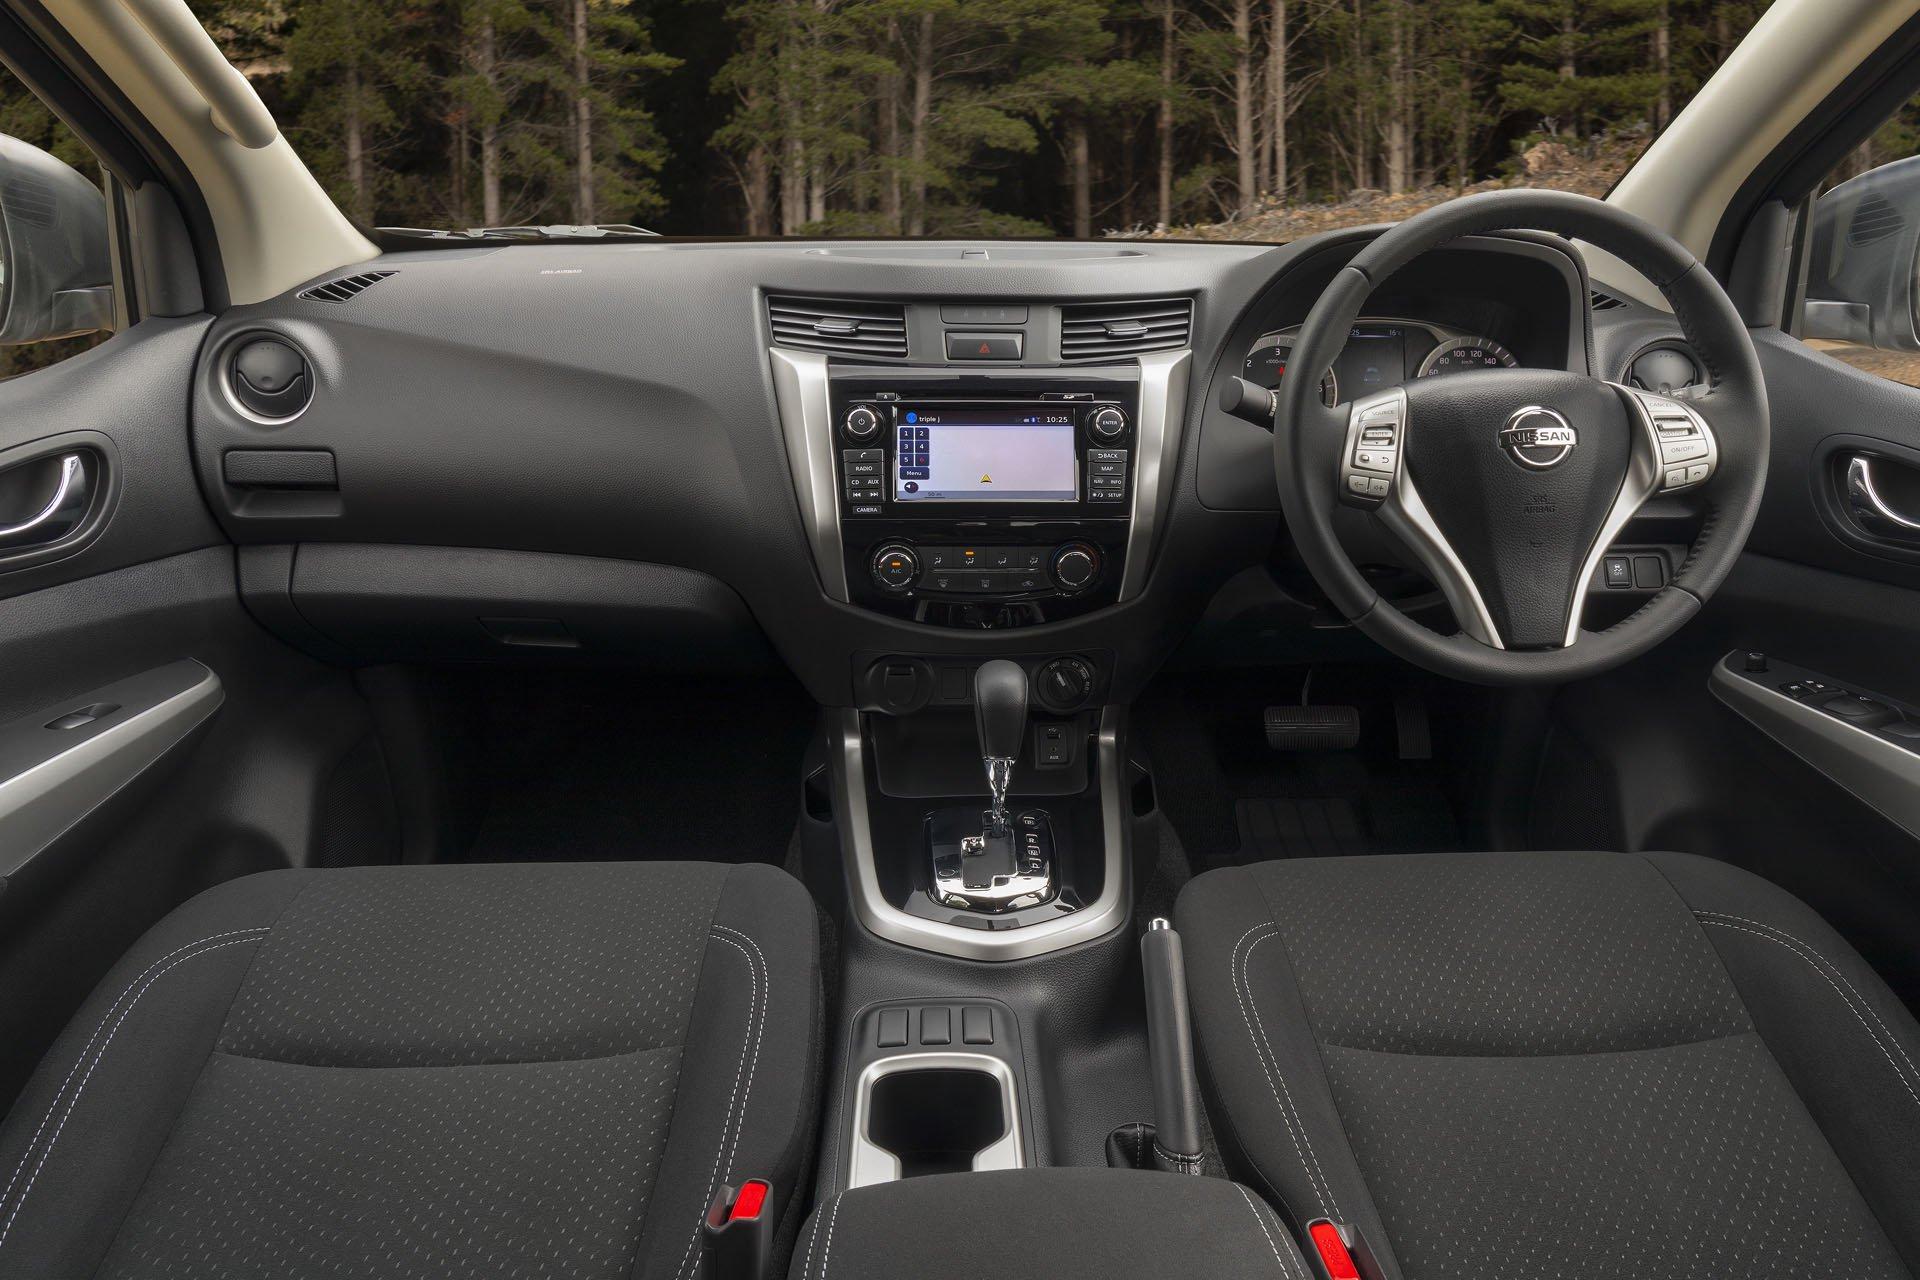 renault nissan launches new v6 dci diesel autoevolution. Black Bedroom Furniture Sets. Home Design Ideas